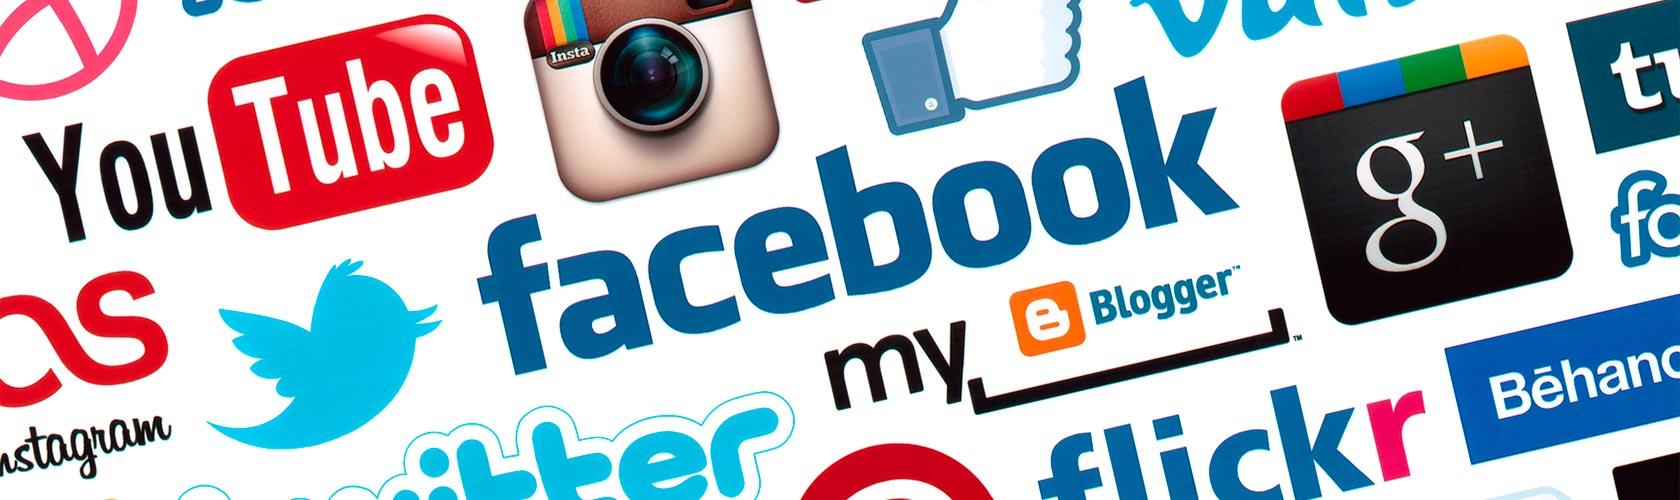 social-media-icons_xs2